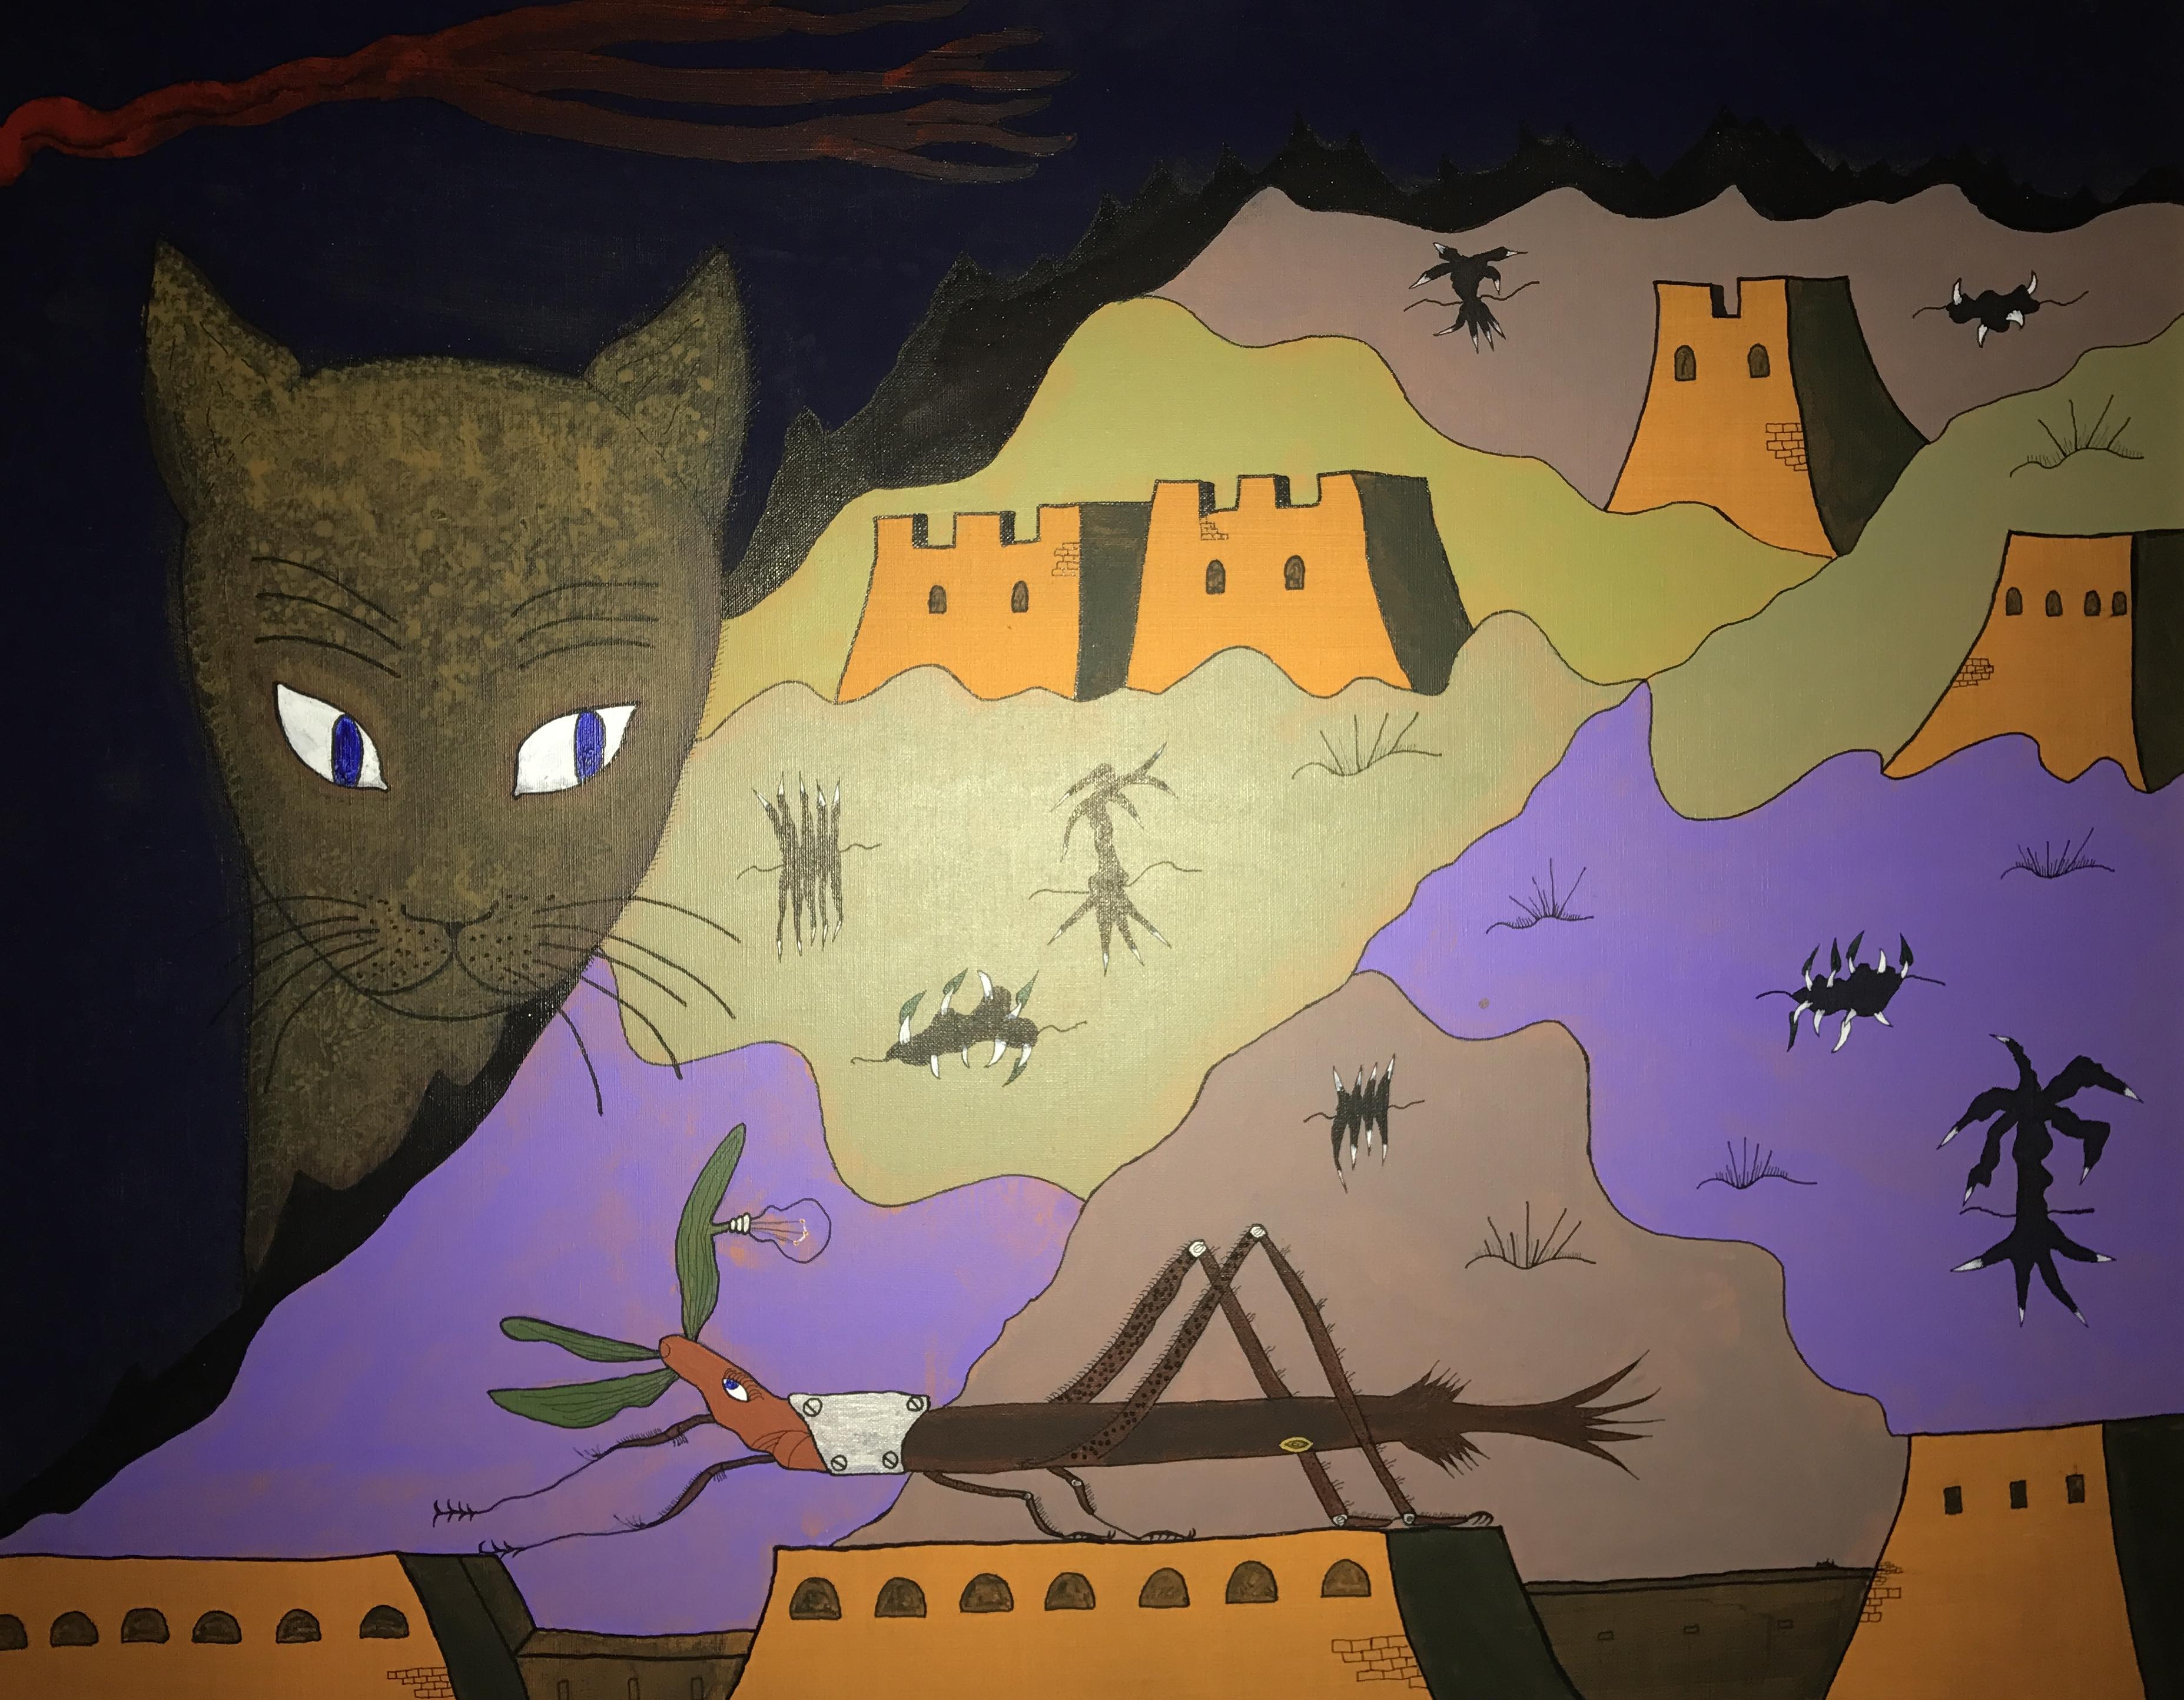 Tableau acrylique (65 x 81 cm) de Fernando Arrabal, 1985